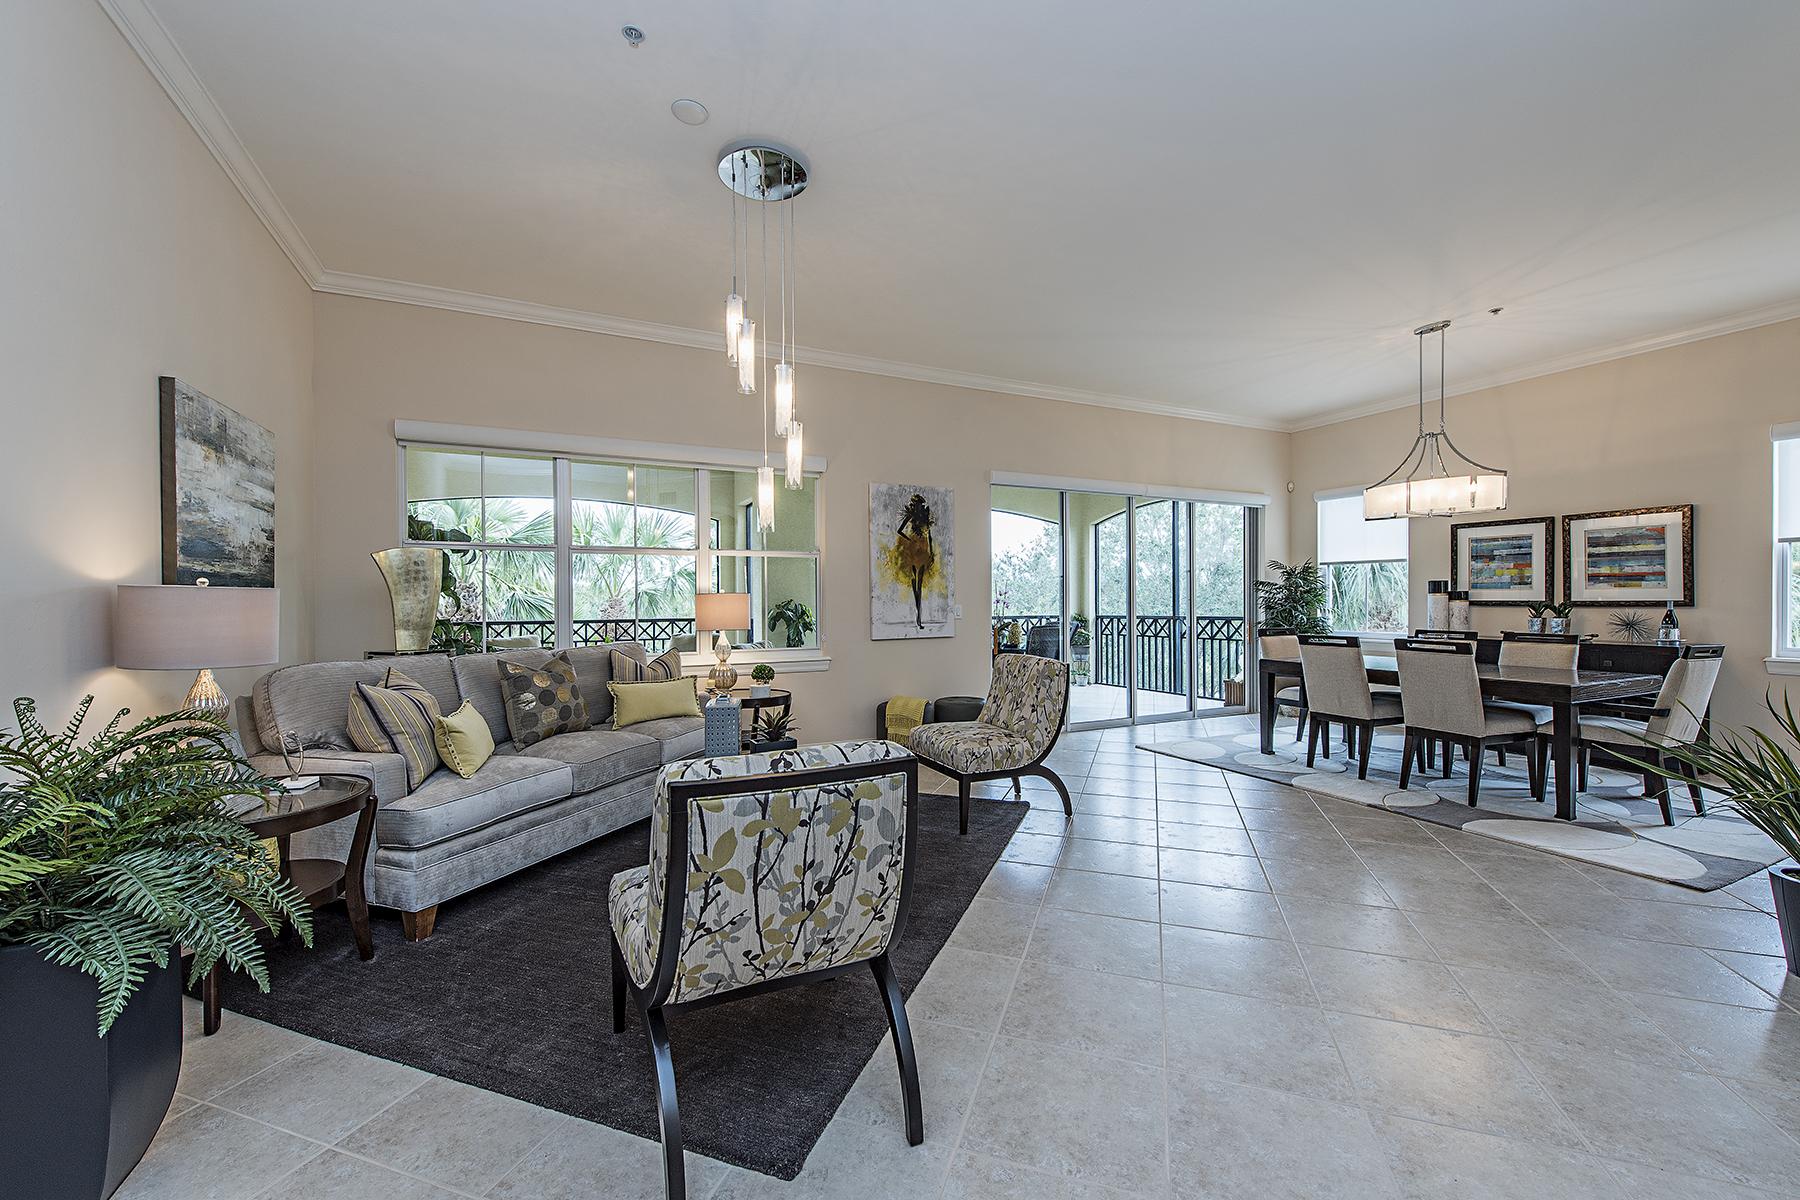 Condominium for Sale at Naples 2854 Tiburon Blvd E 103, Naples, Florida 34109 United States